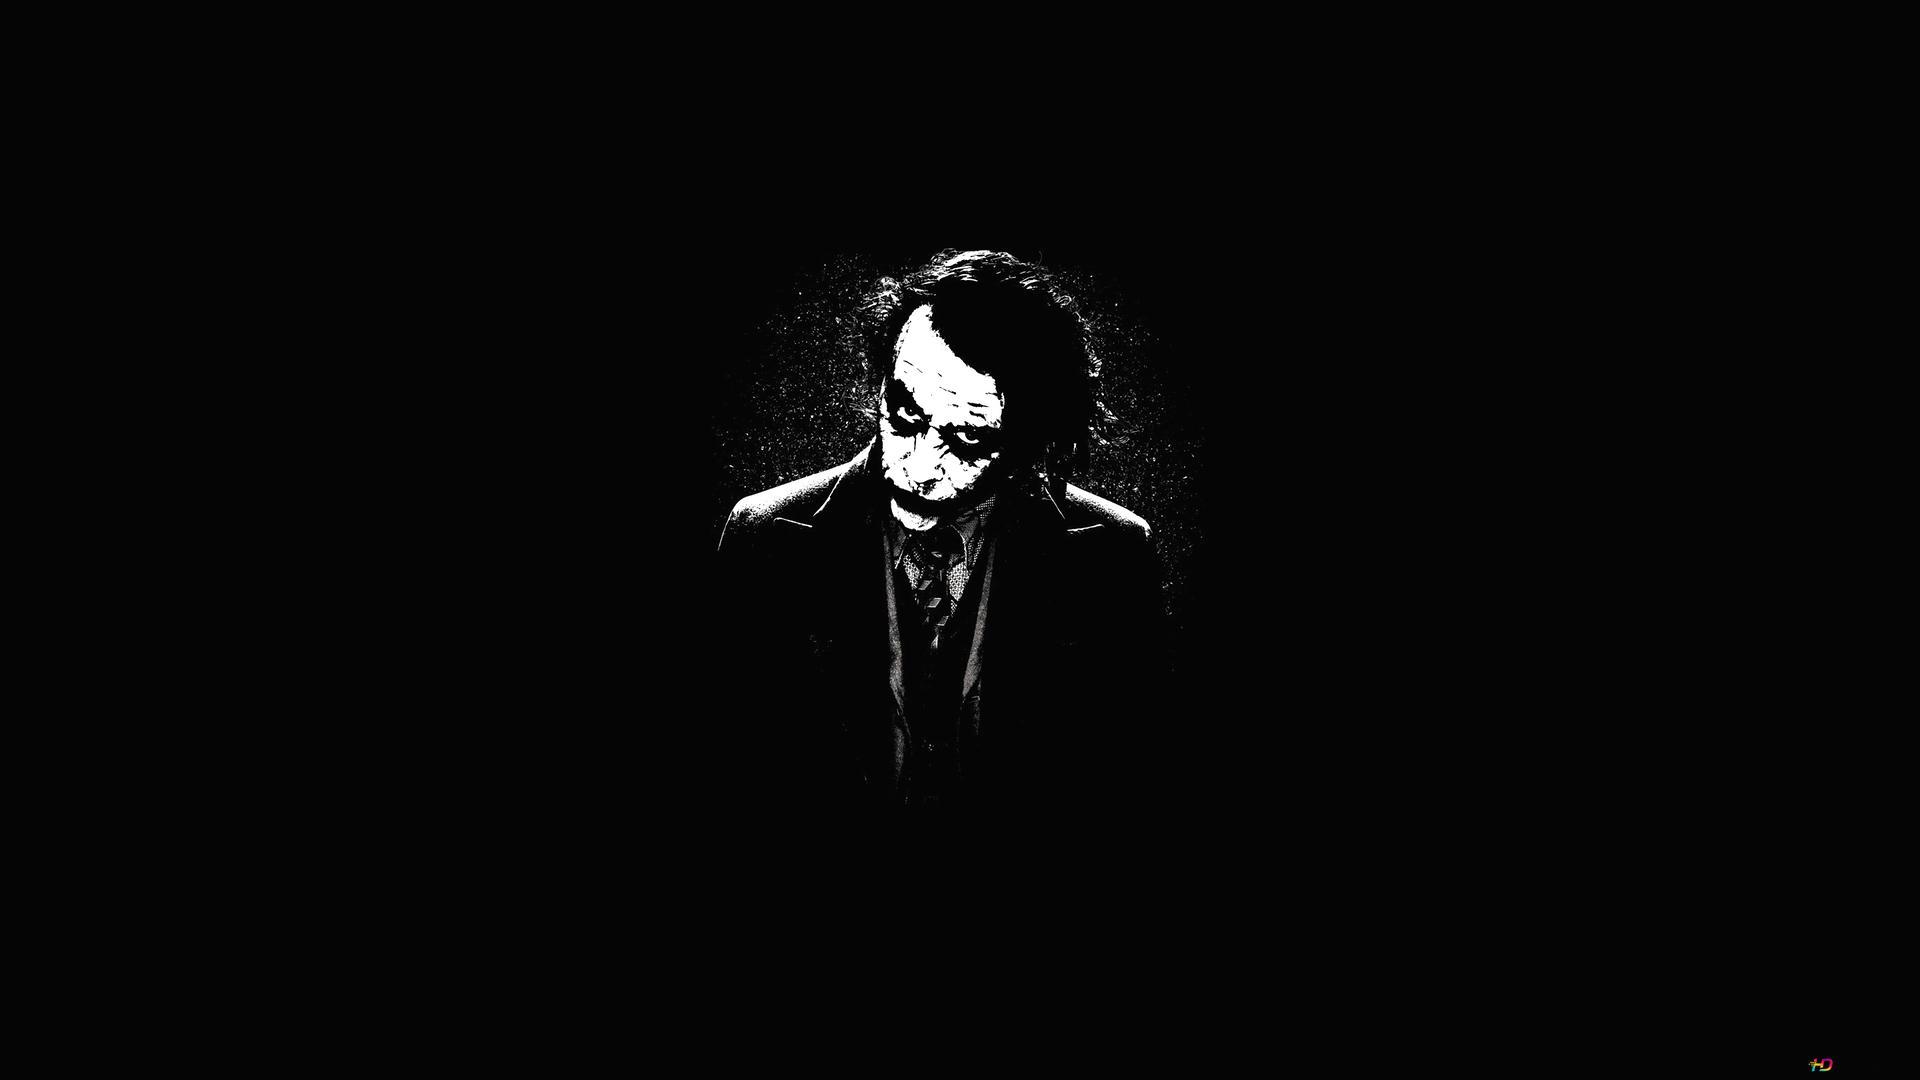 Joker Minimalist Hd Wallpaper Download